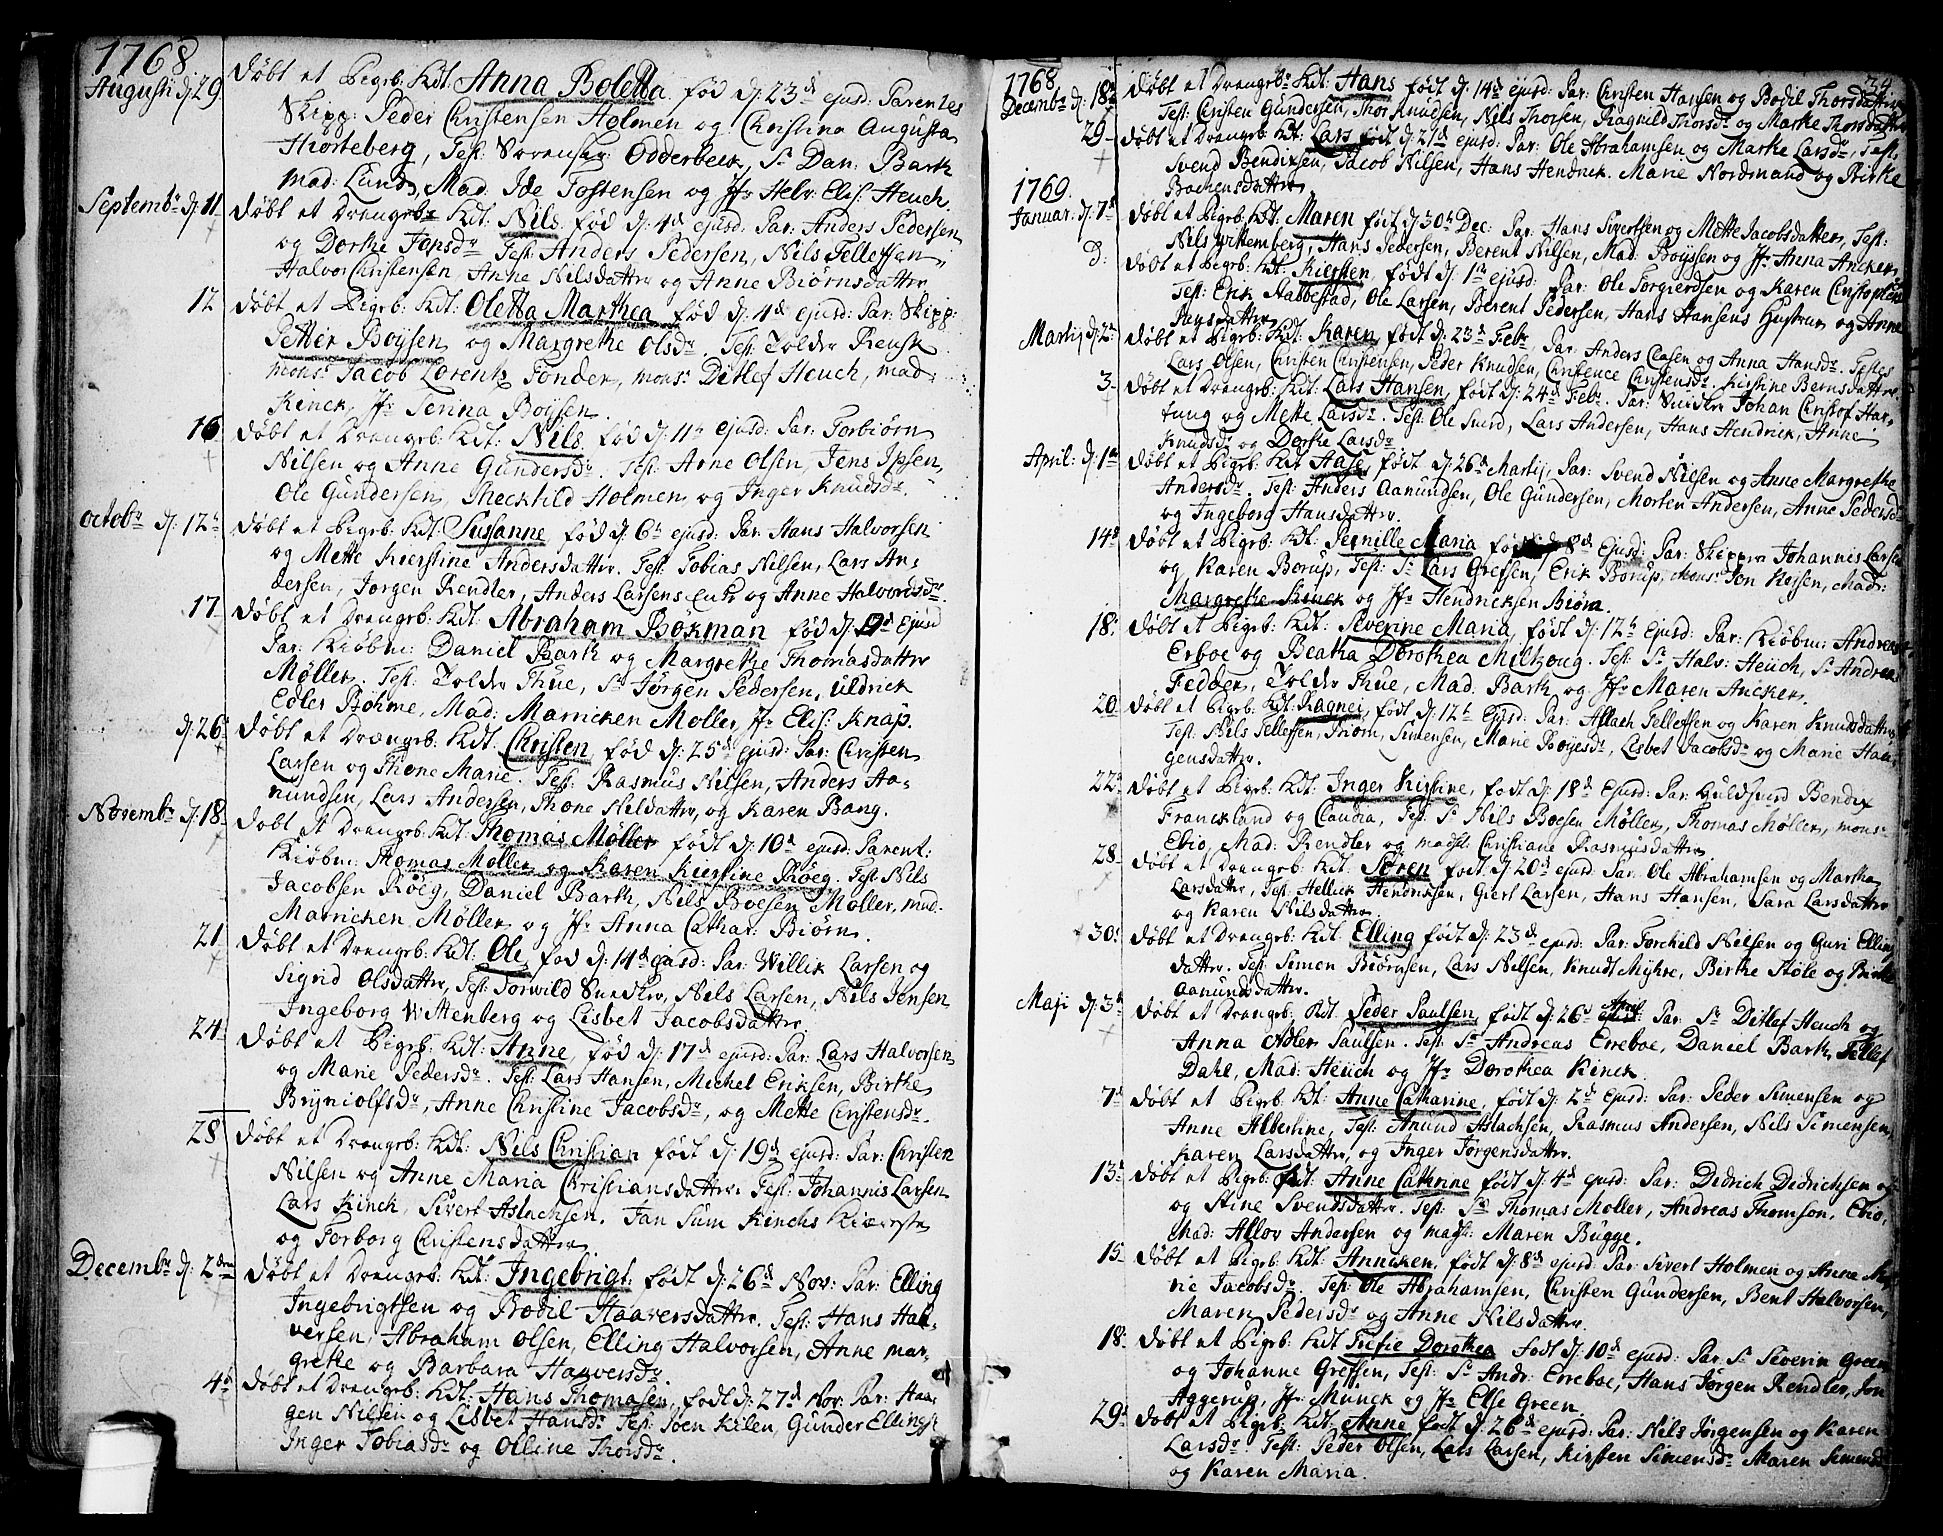 SAKO, Kragerø kirkebøker, F/Fa/L0002: Ministerialbok nr. 2, 1767-1802, s. 34